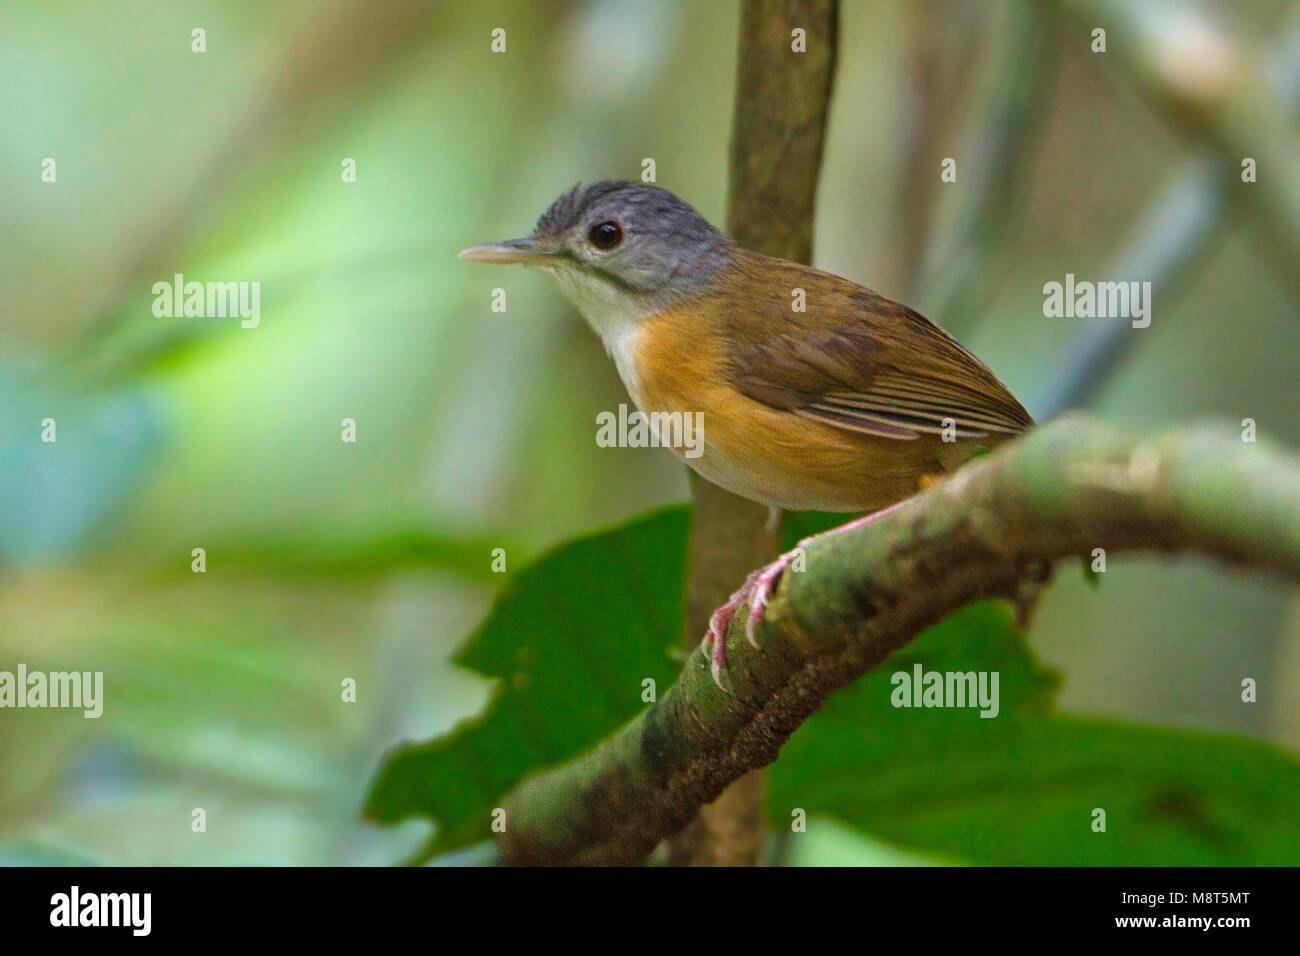 Vogel Bild von Most Shapiro Stockbild